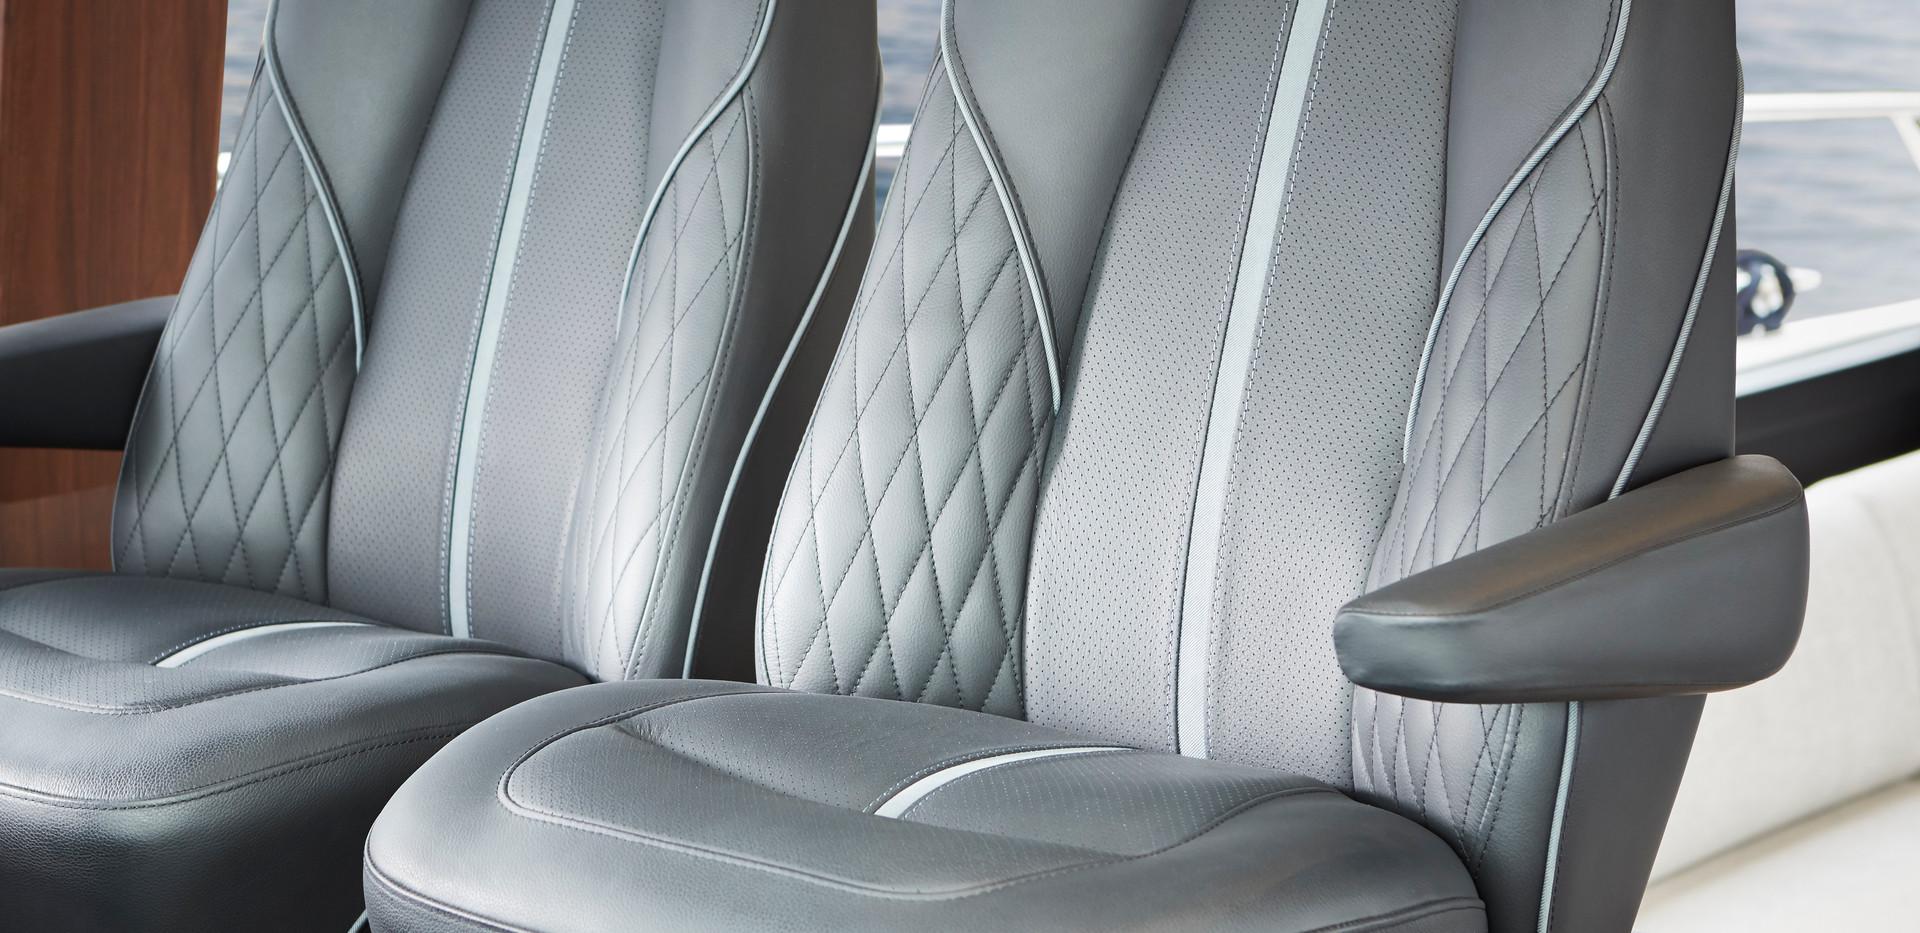 s78-interior-helm-seatsAbromowitz Sharp